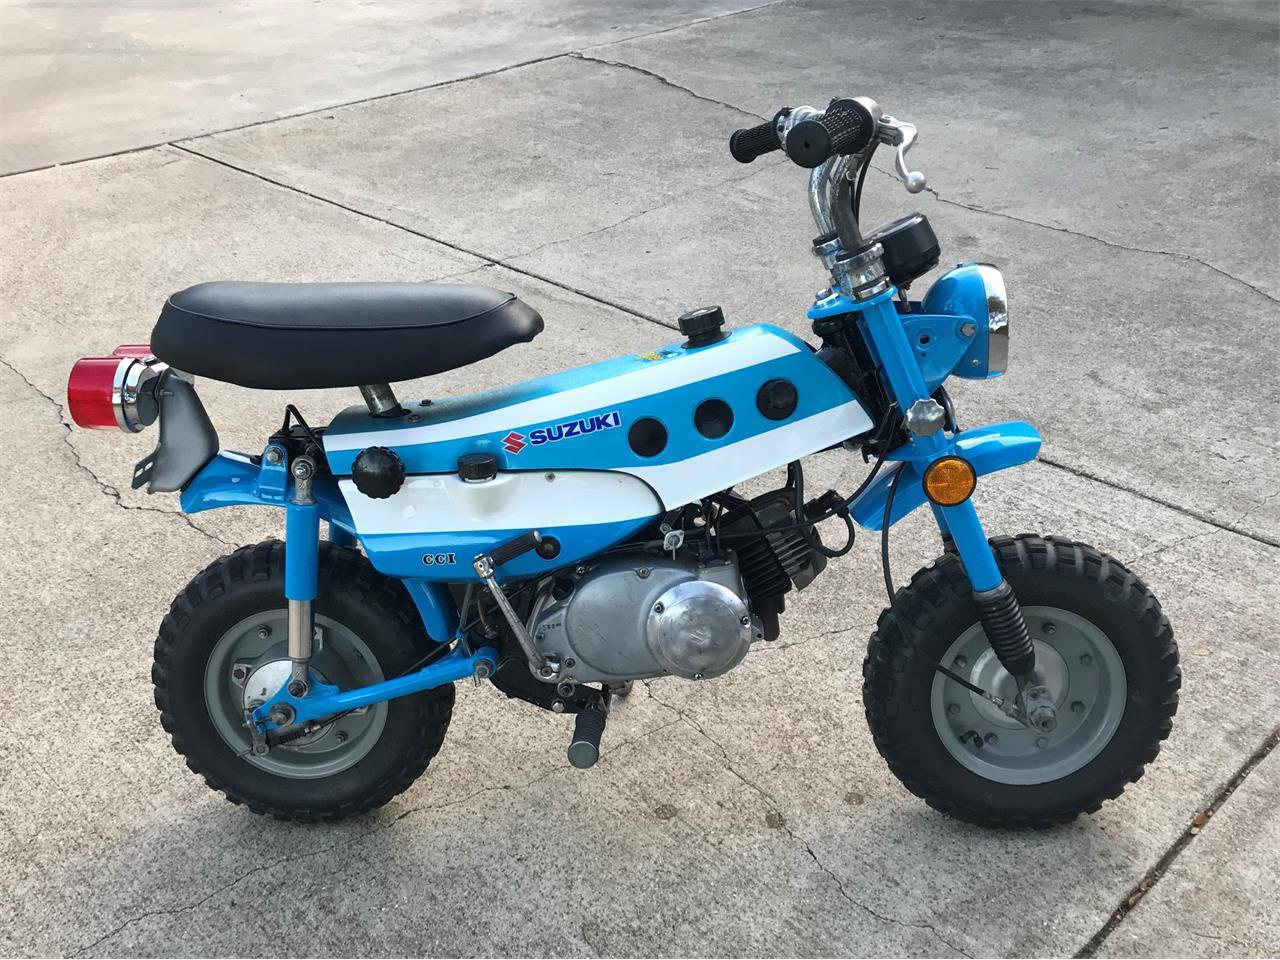 1971 Suzuki Motorcycle (CC-1296653) for sale in Rowlett, Texas